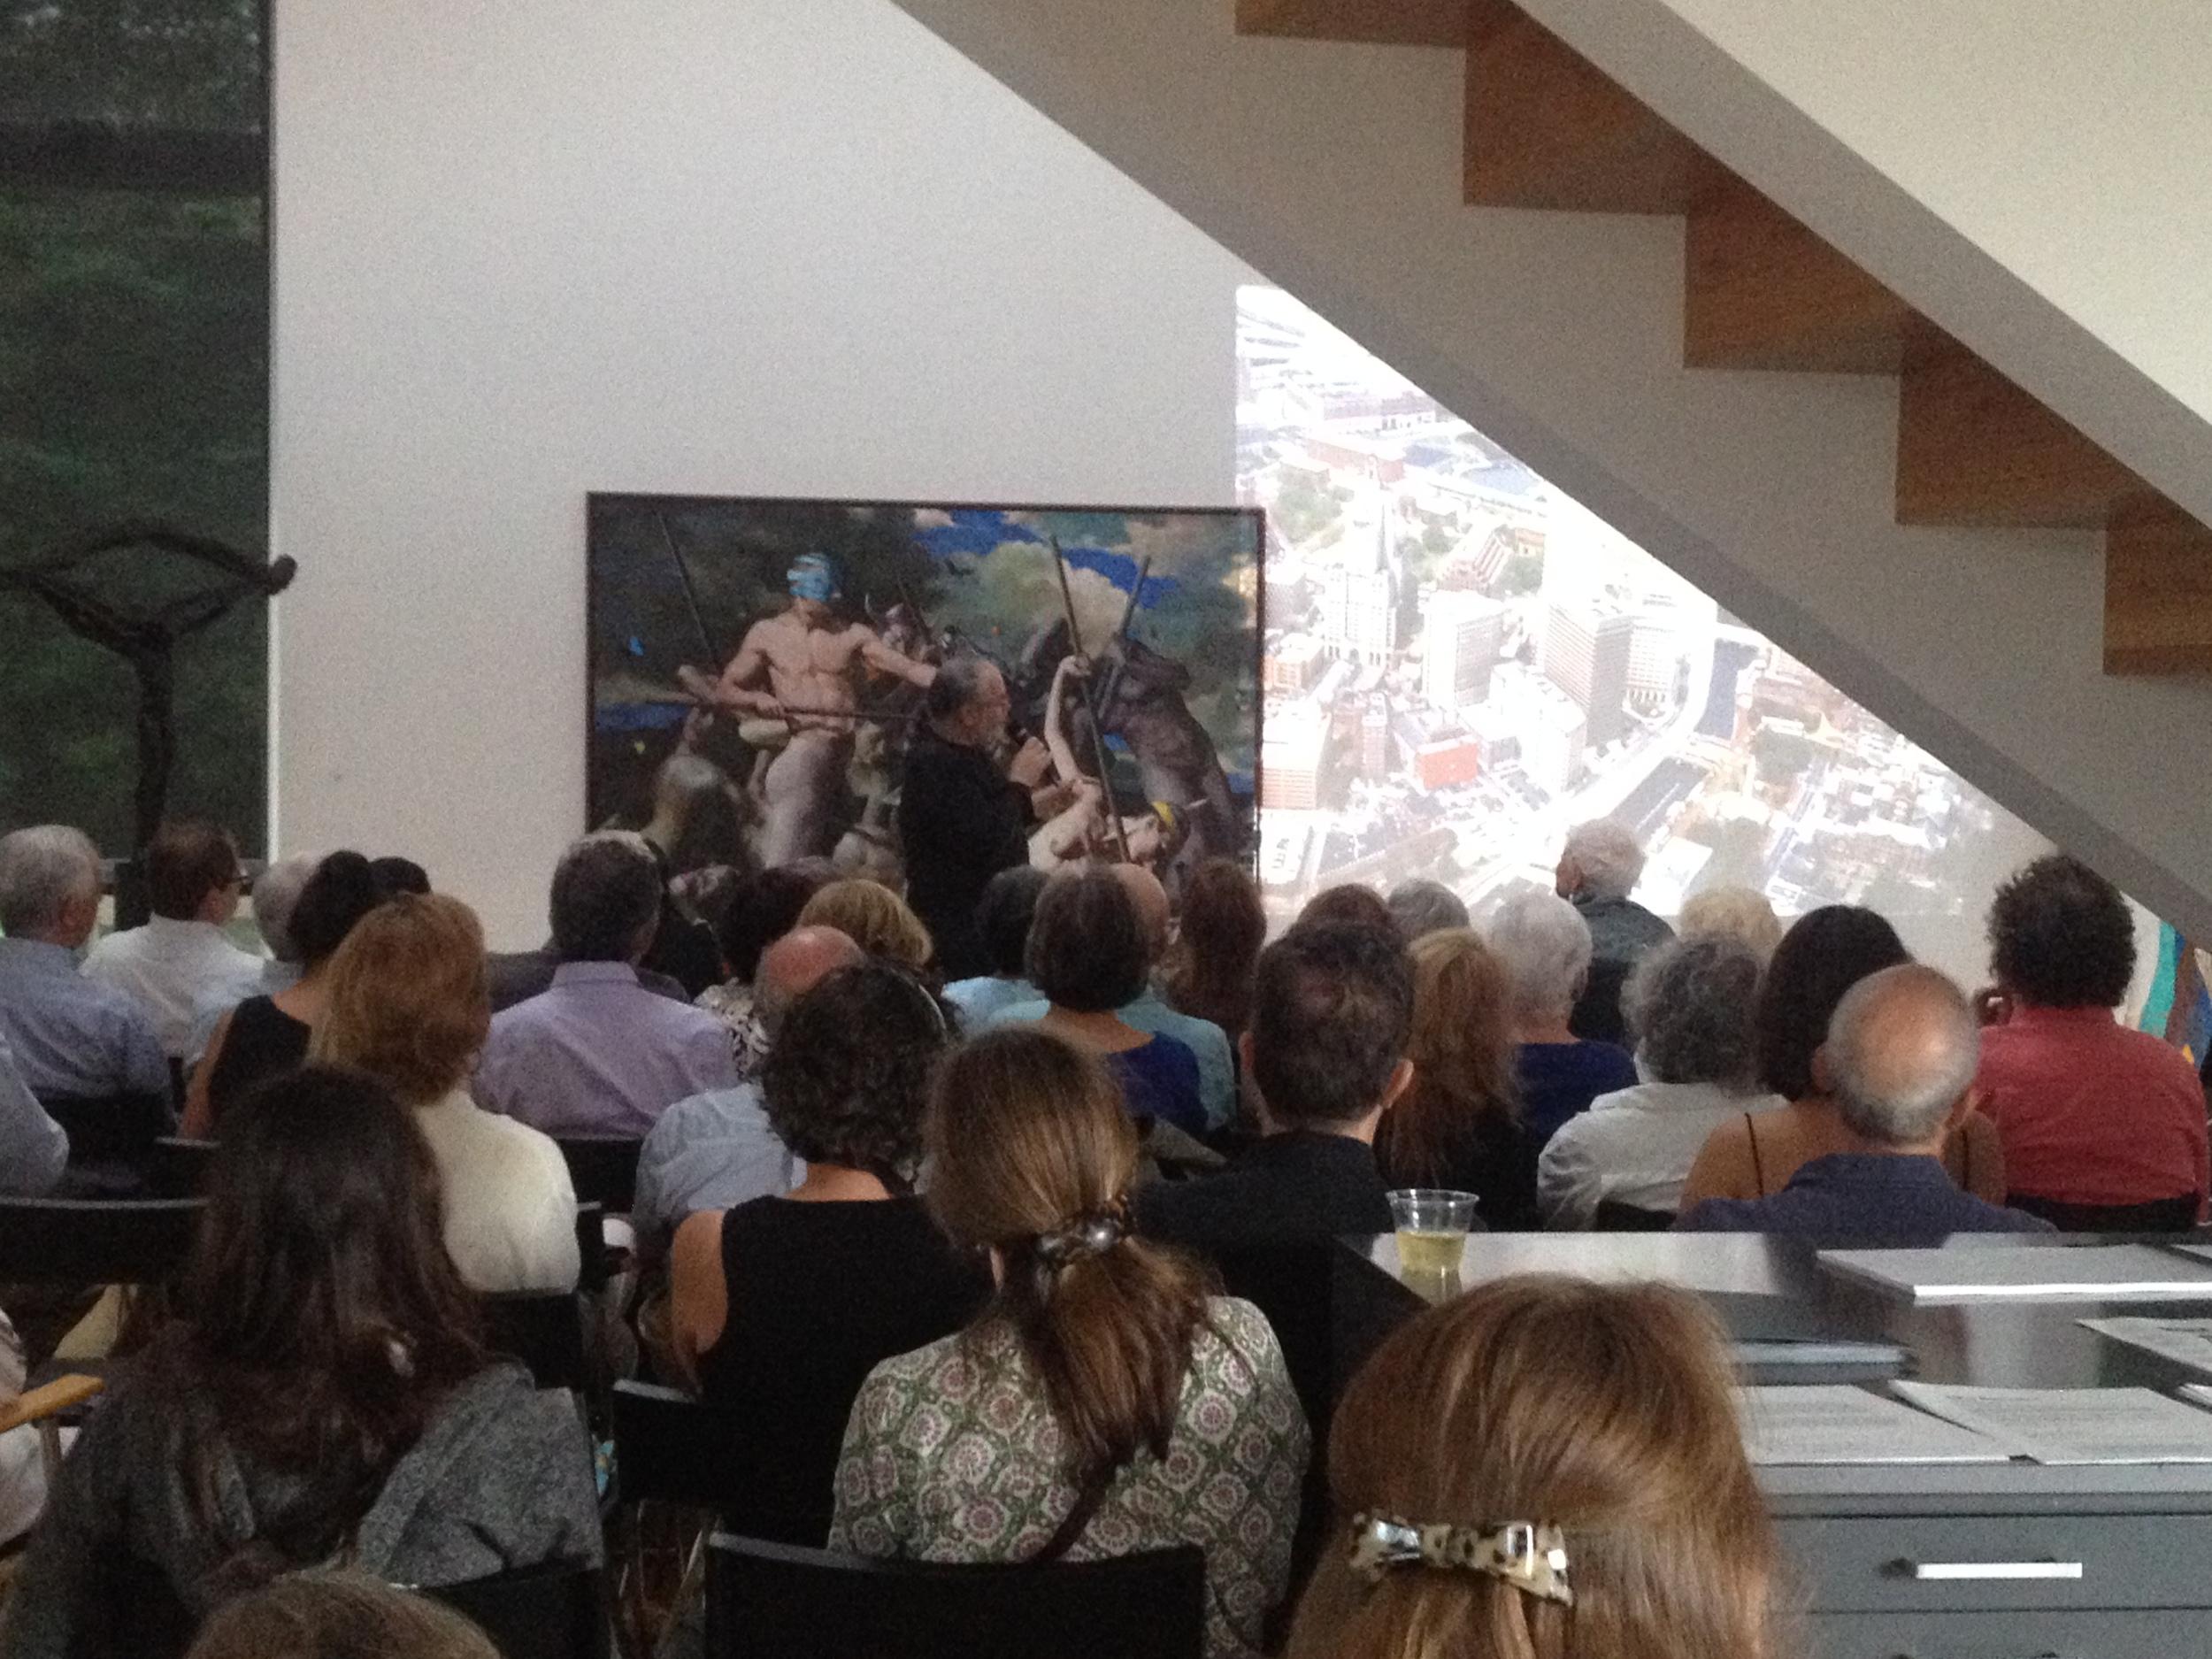 Barnaby Evans giving his talk, WaterFire:Illuminating the Mirror